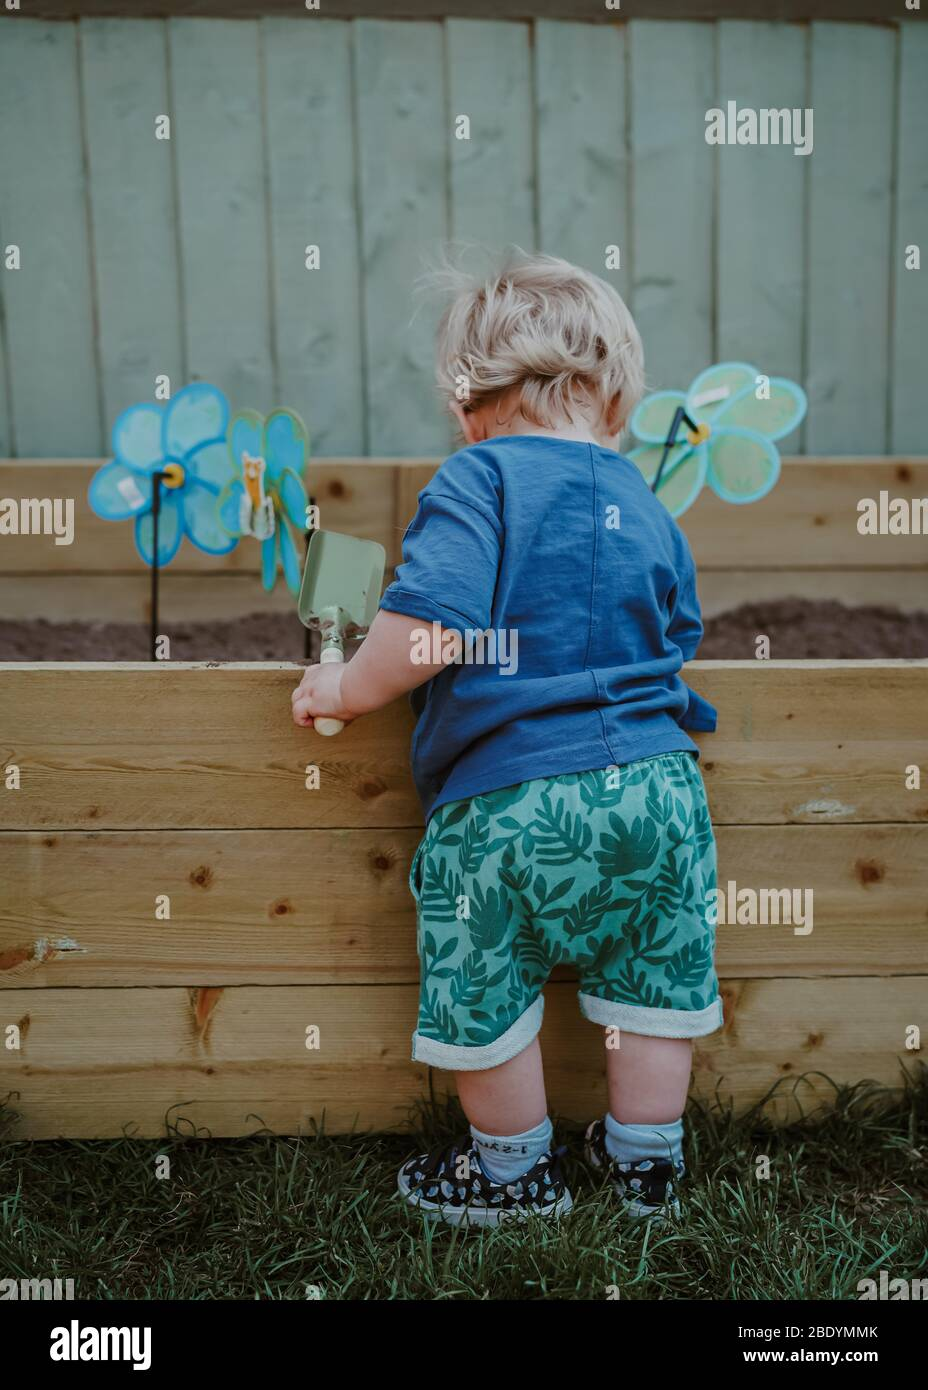 Giardinaggio bambino piccolo bambino Foto Stock